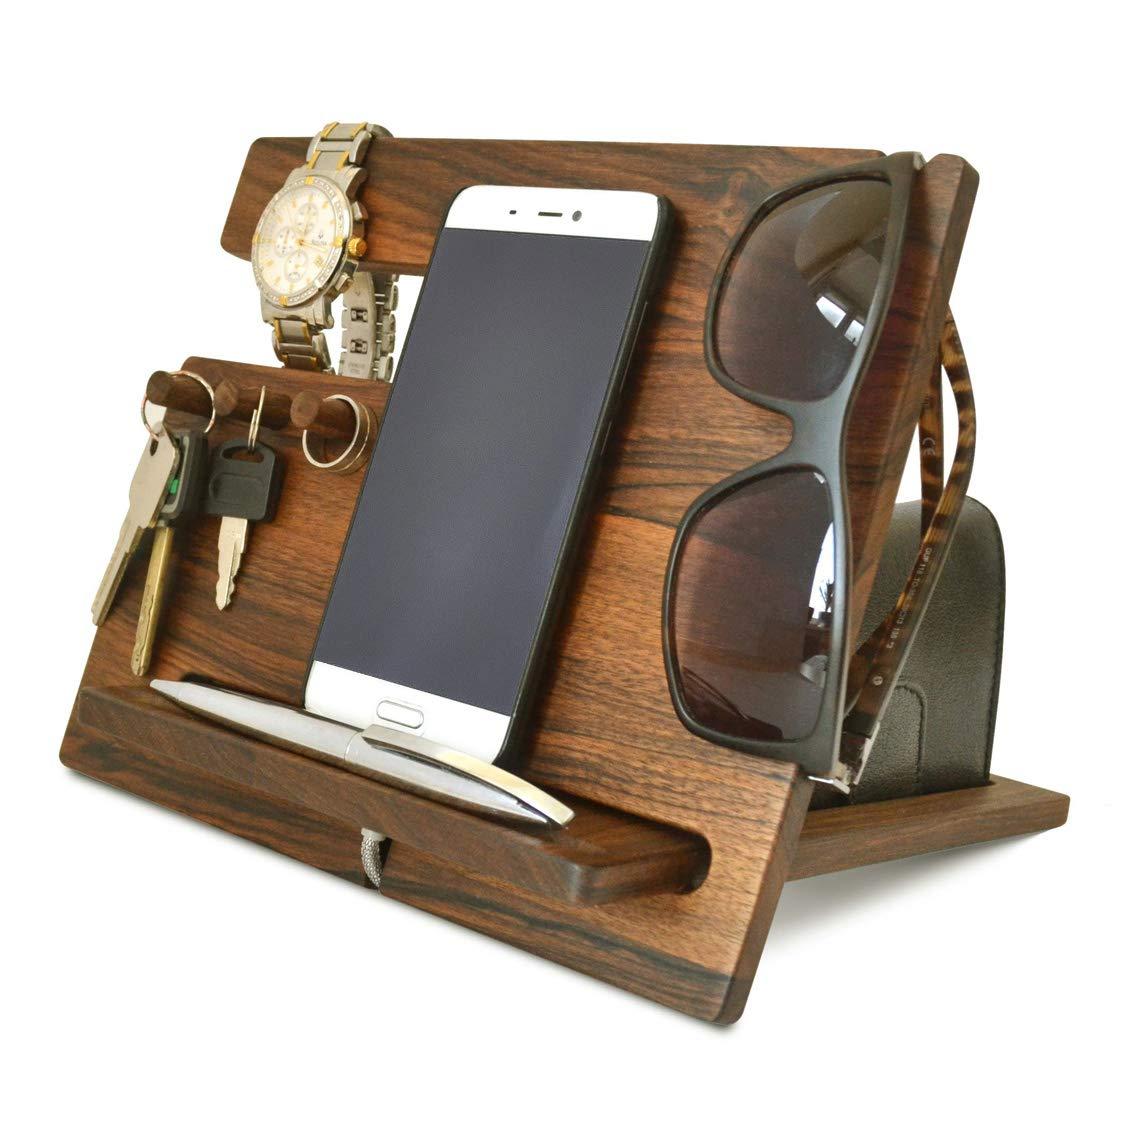 Wood Phone Docking Station, Walnut Desk Organizer, Tablet Holder, Key Hooks, Coin, Wallet, Watch Stand, Handmade Men Graduation Gift, Husband Anniversary, Dad Birthday Idea, Nightstand for Him, Gadget